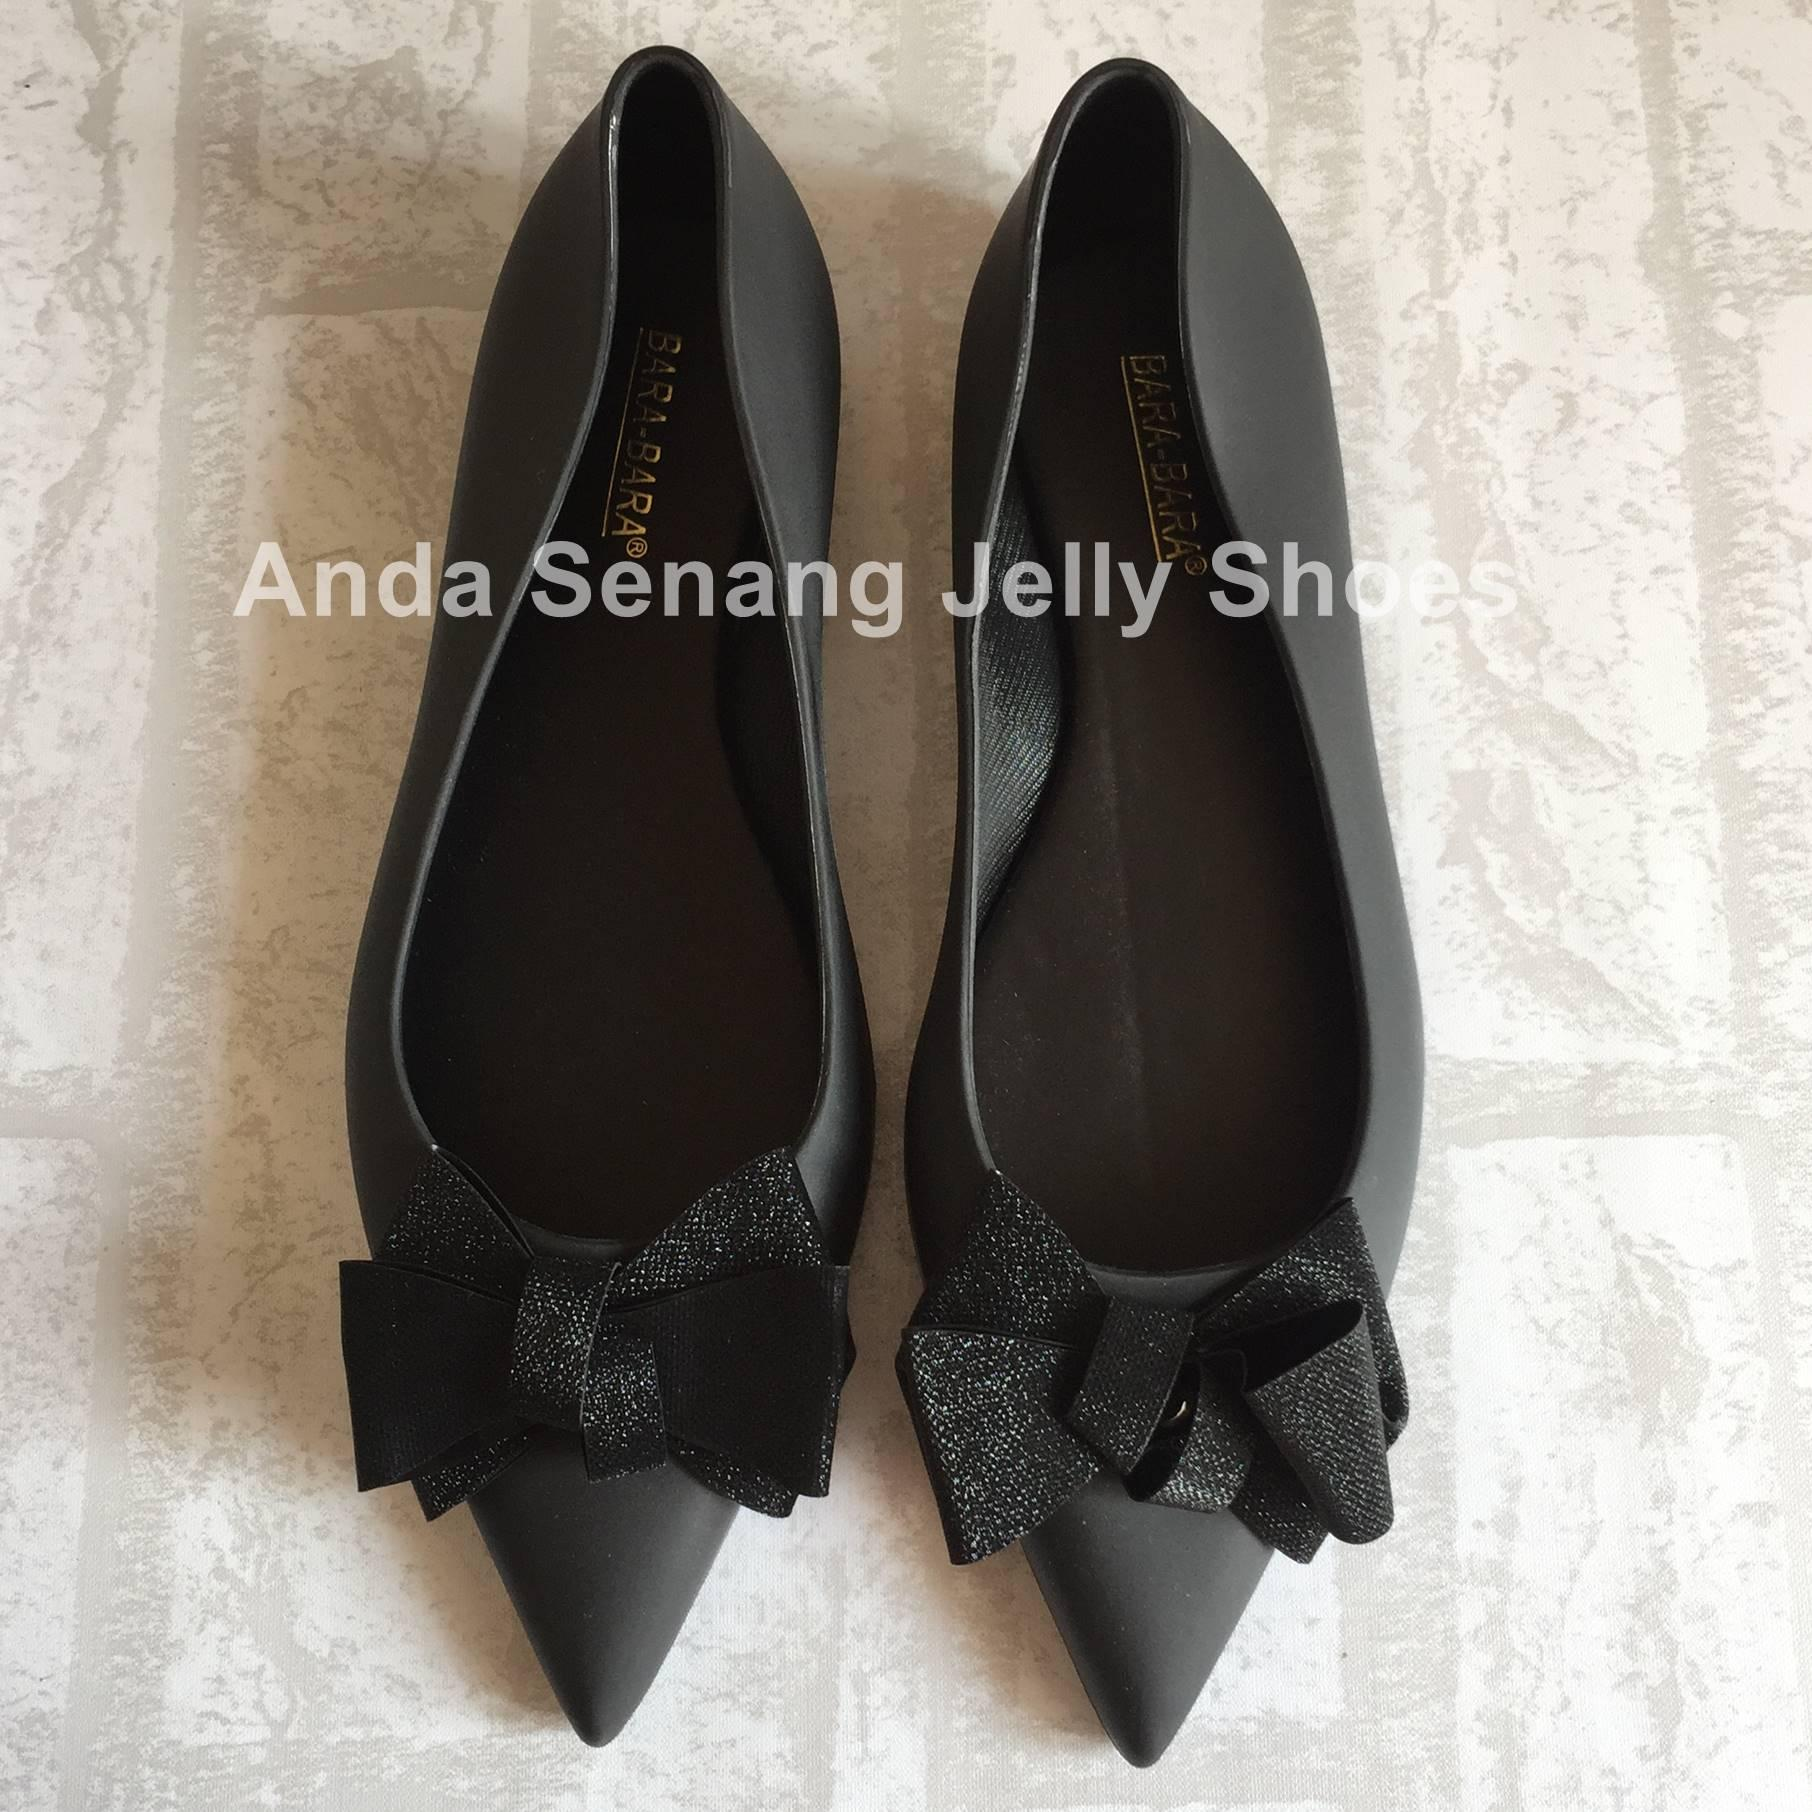 Bara Bara Jelly Shoes Flat Shoes Sepatu Jelly Sepatu Wanita Lancip Model Pita Kode 80223PTGL